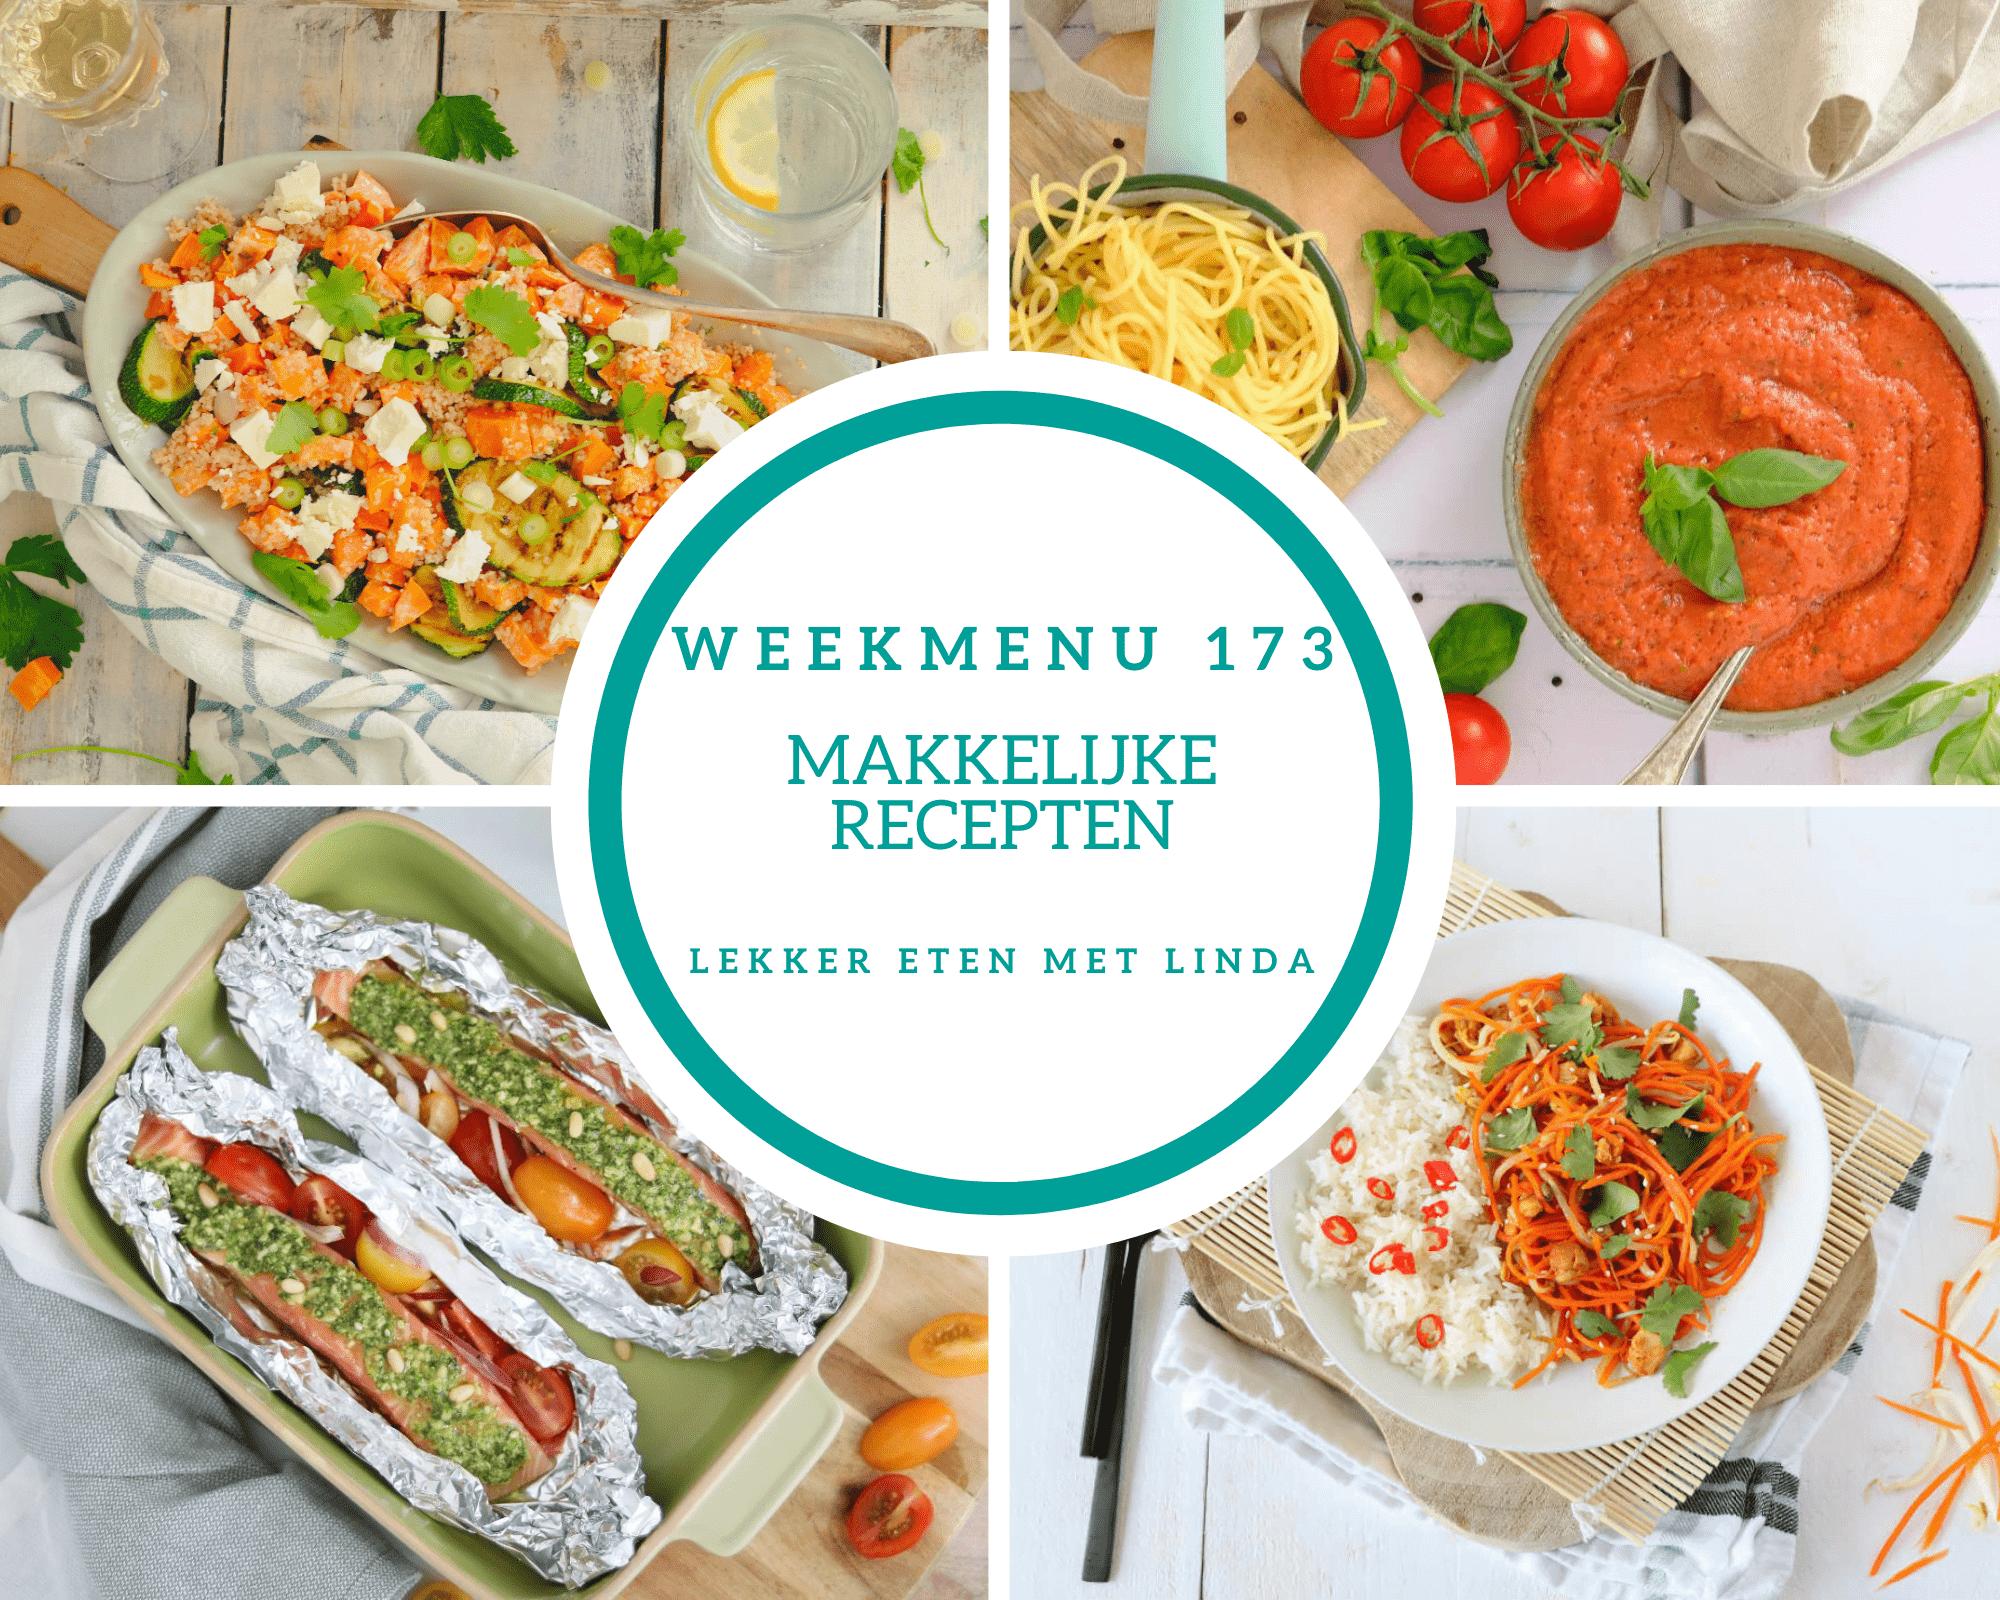 Weekmenu 173 makkelijke recepten